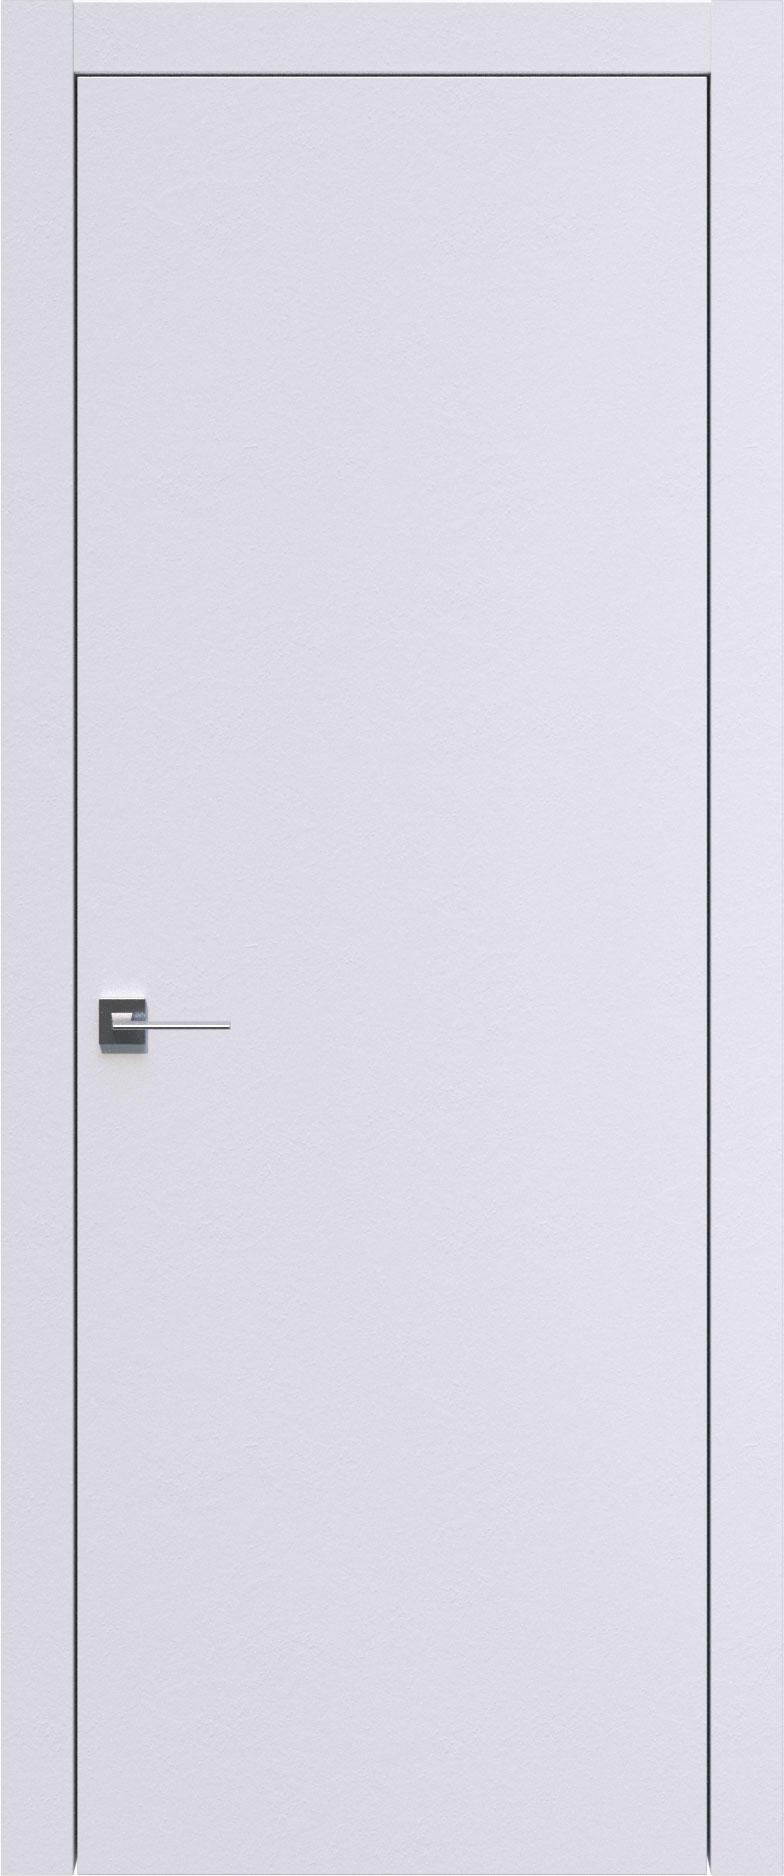 Tivoli А-1 цвет - Арктик белый Без стекла (ДГ)